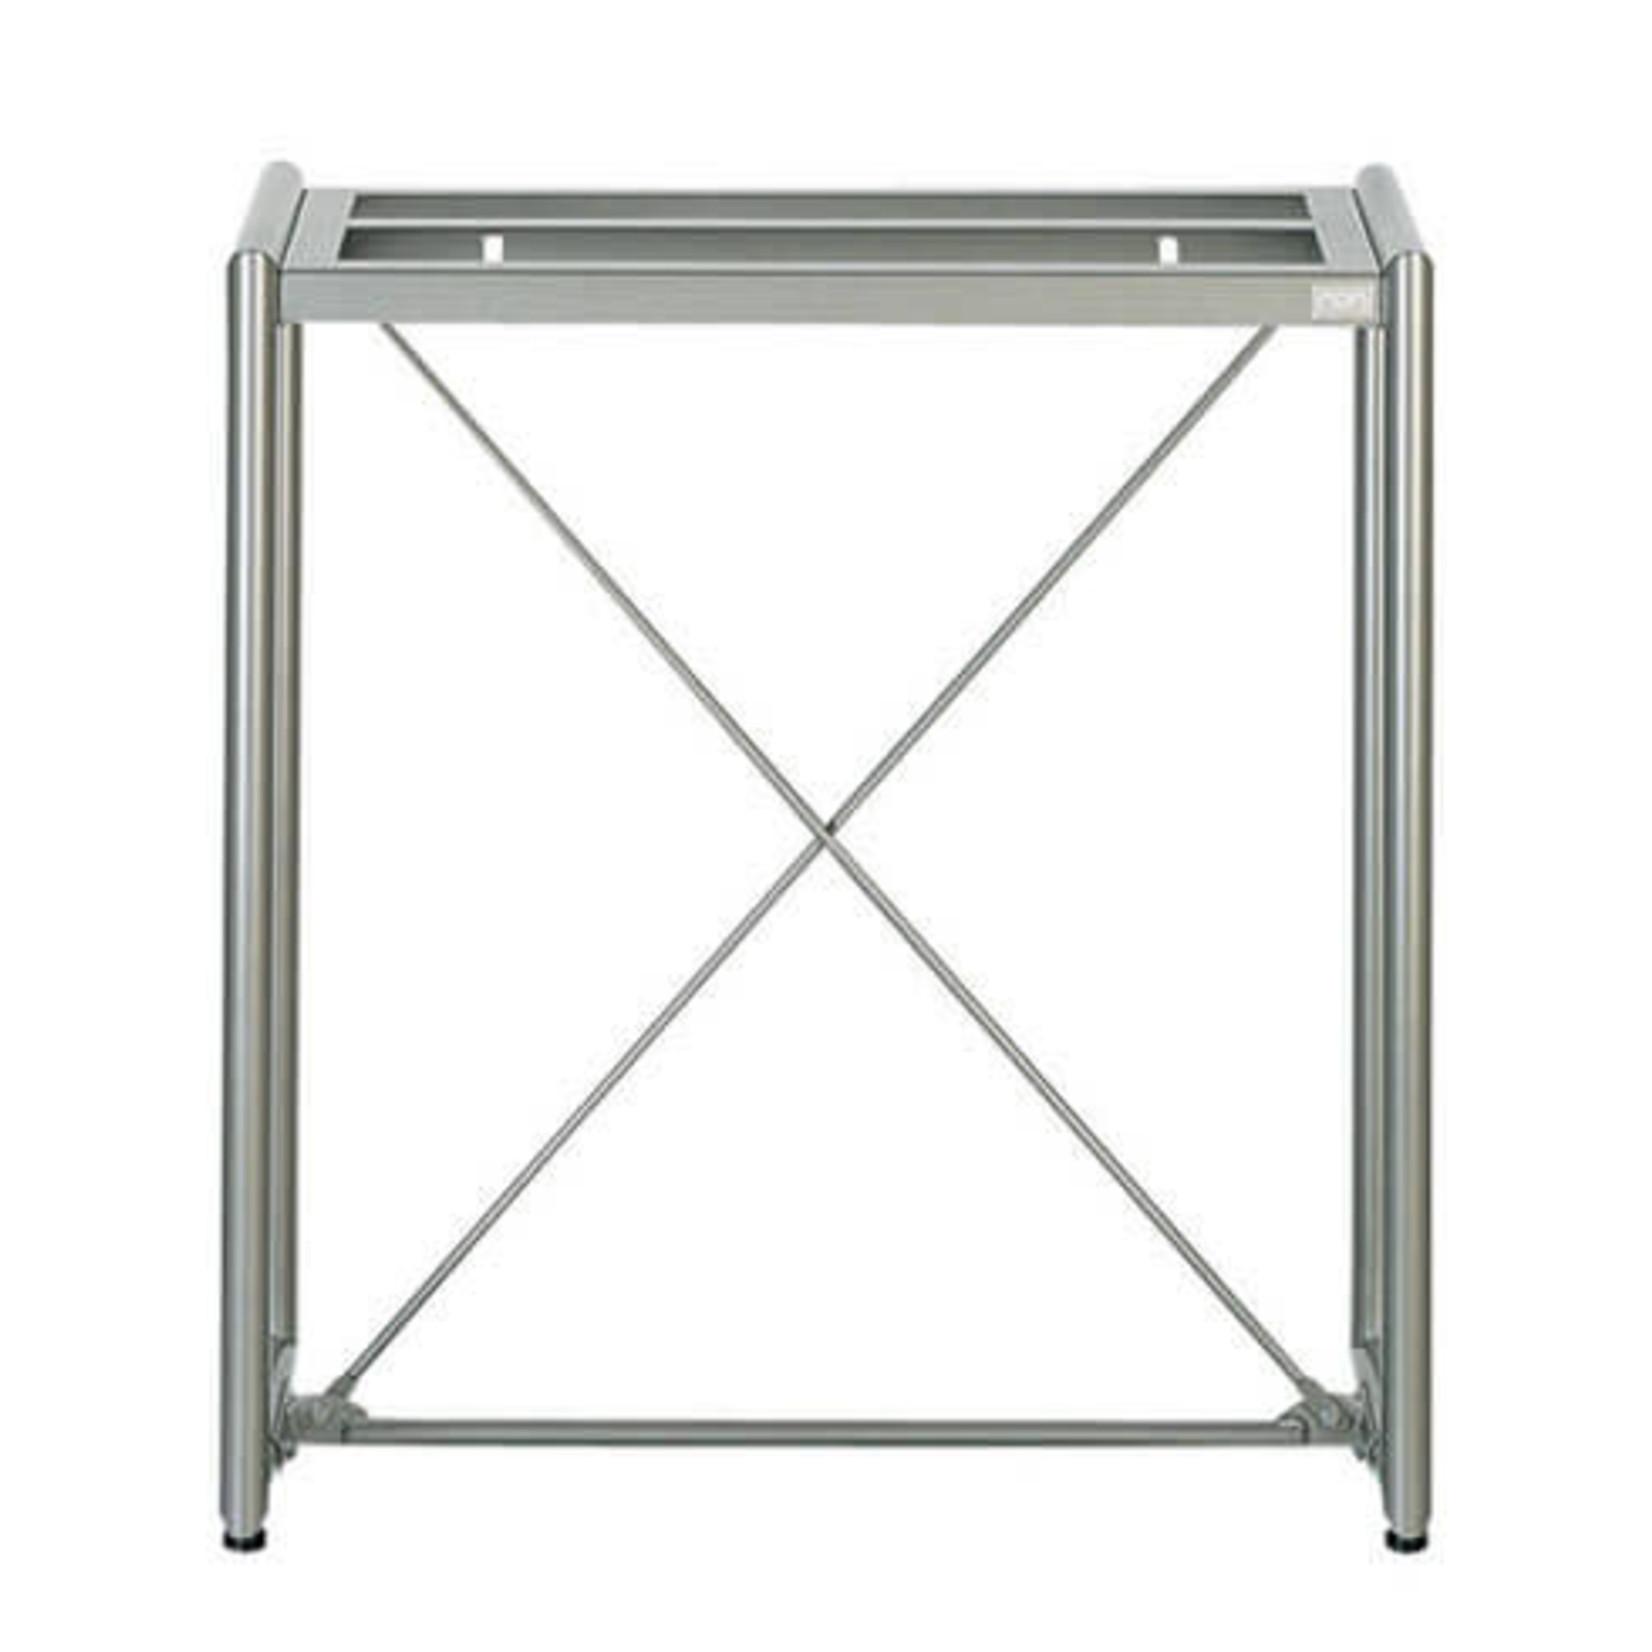 ADA Garden Stand-90 Metalic (90 x 45 cm)-Undercarriage